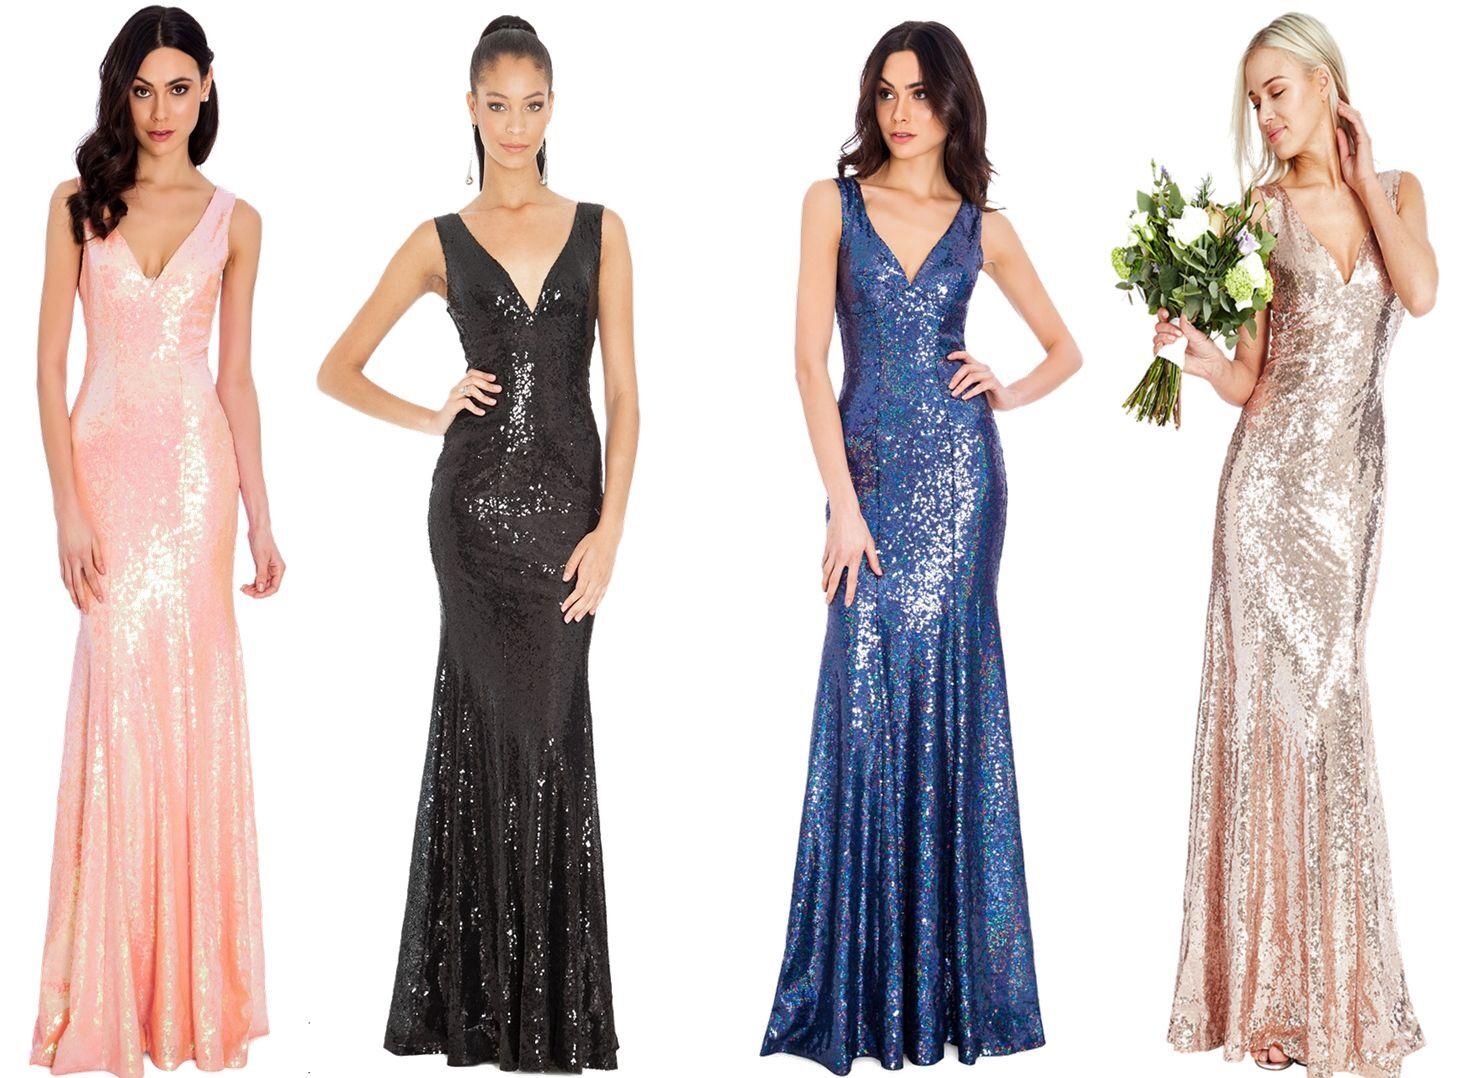 Womens Goddiva Blue Sparkly Sequin Elegant Formal Evening Ball Gown 8 10 12 14